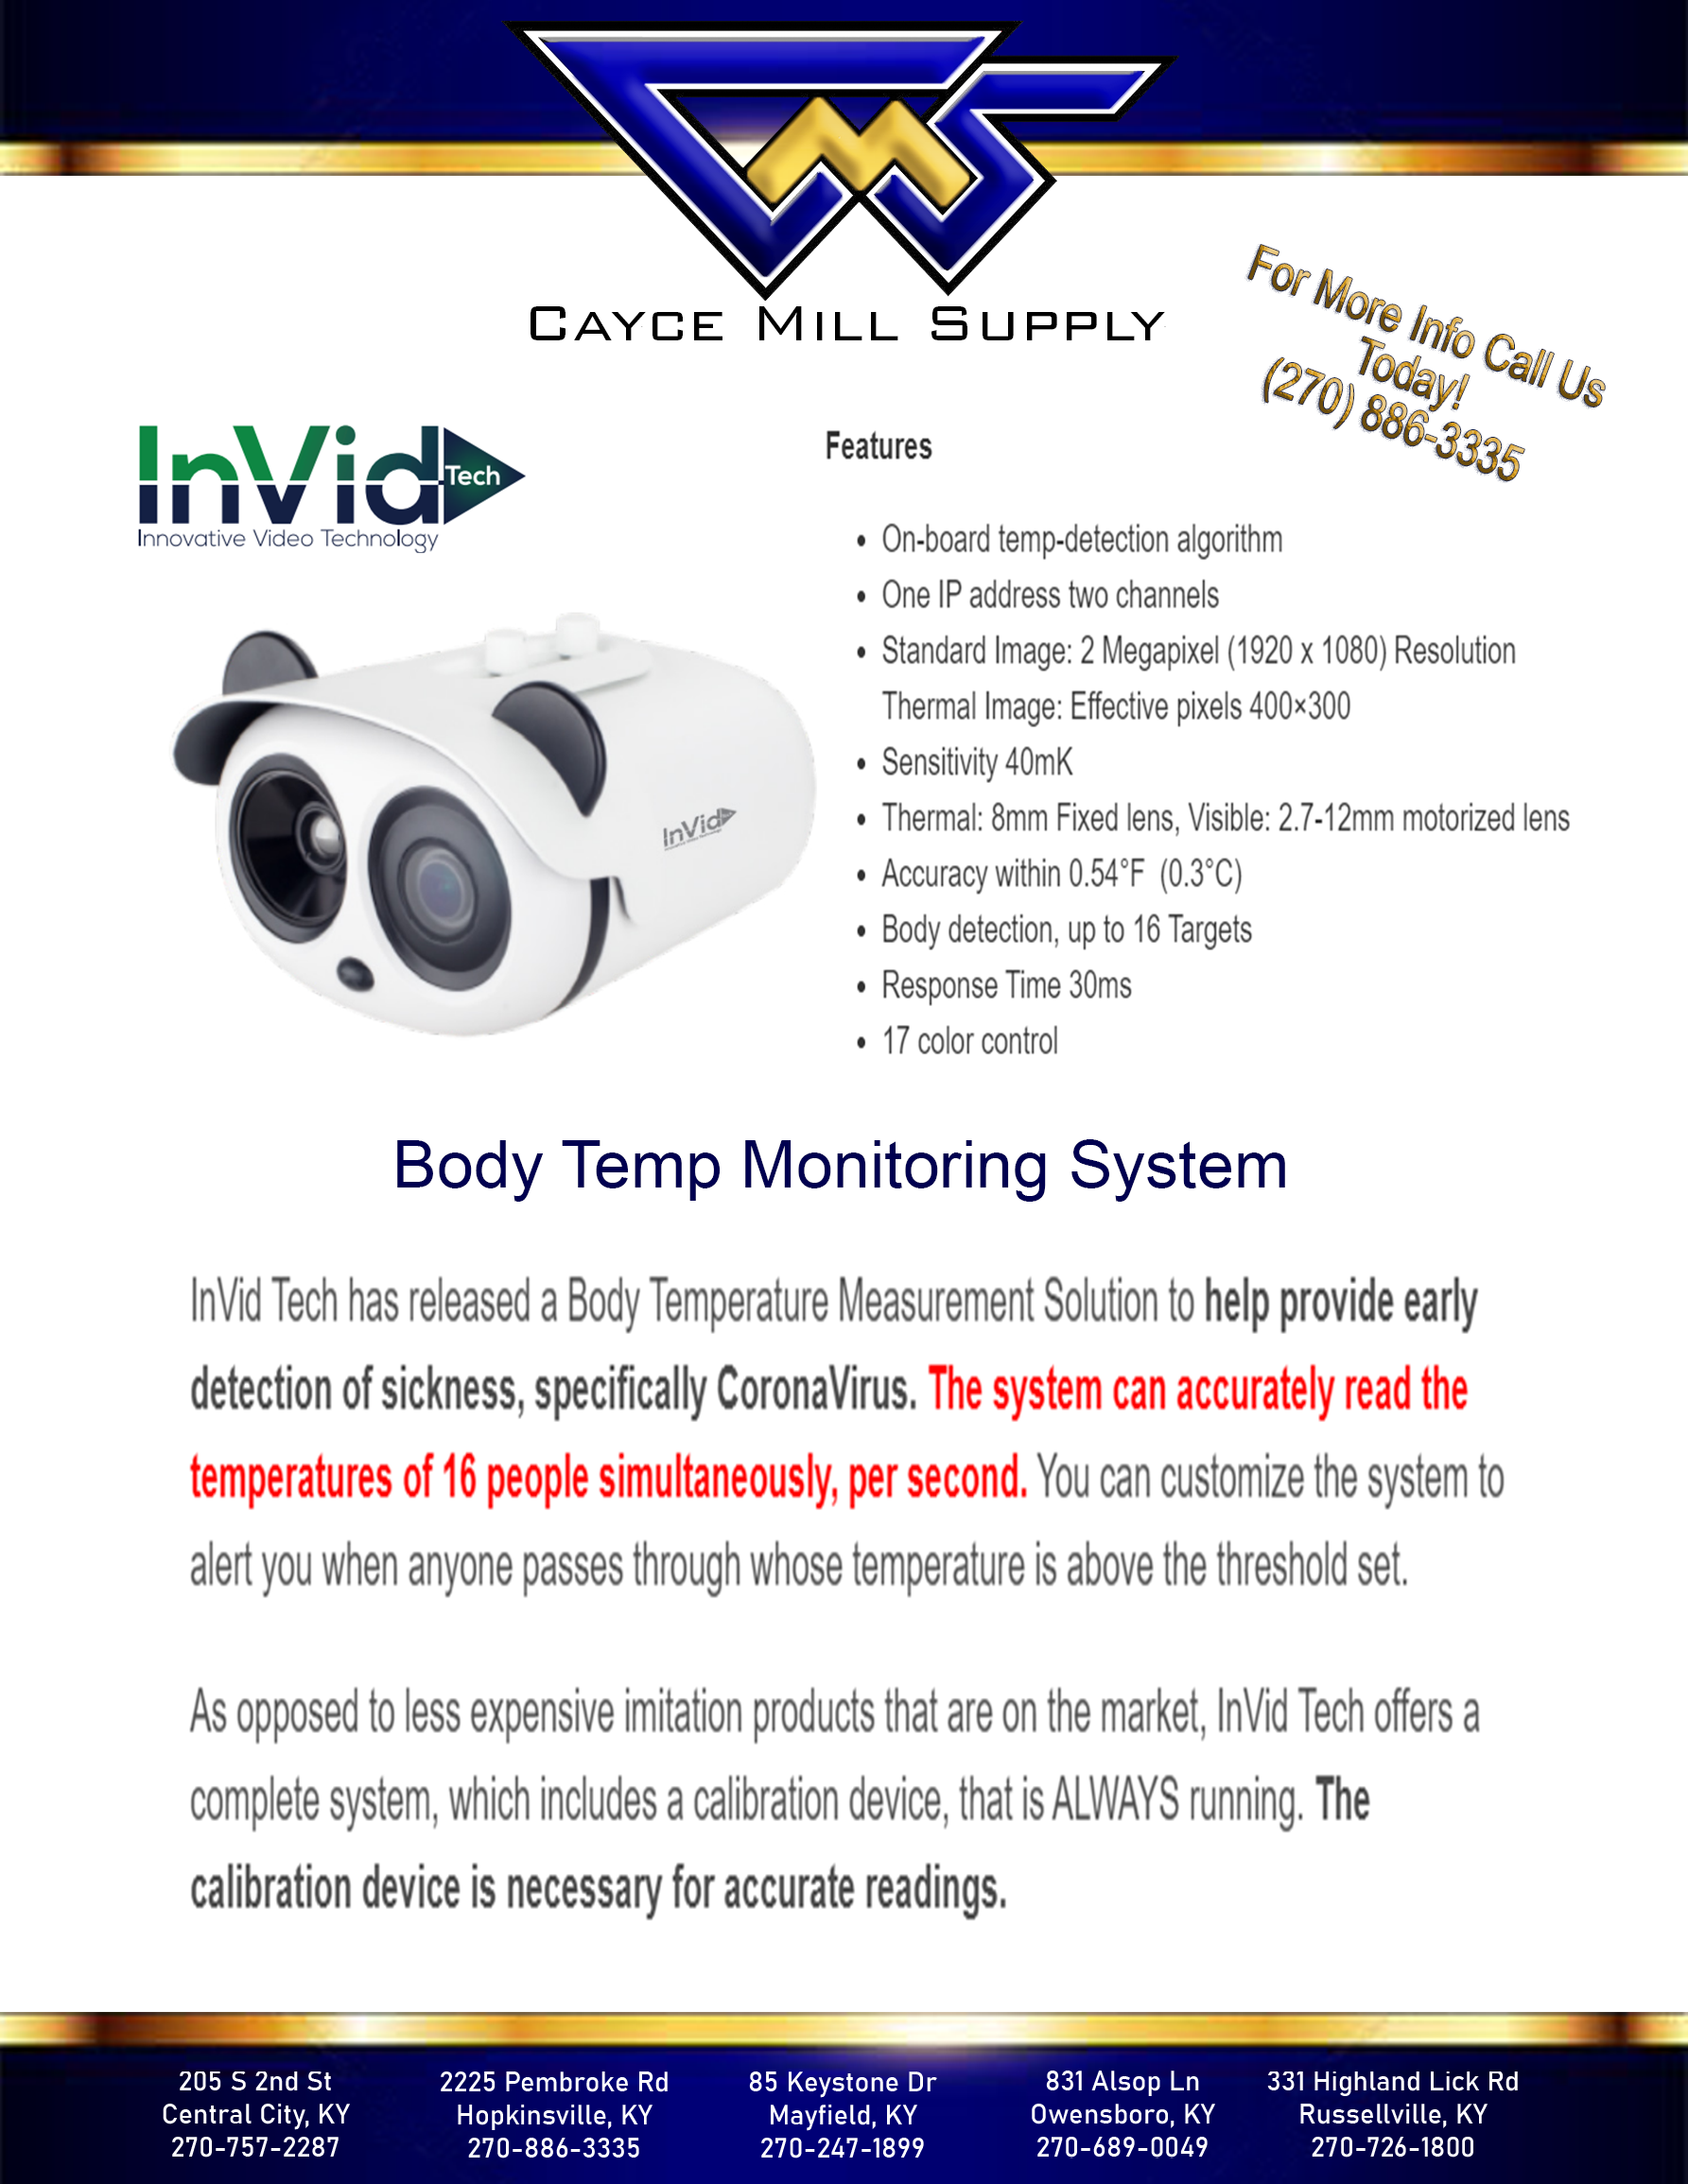 InVid Body Temp Monitoring System